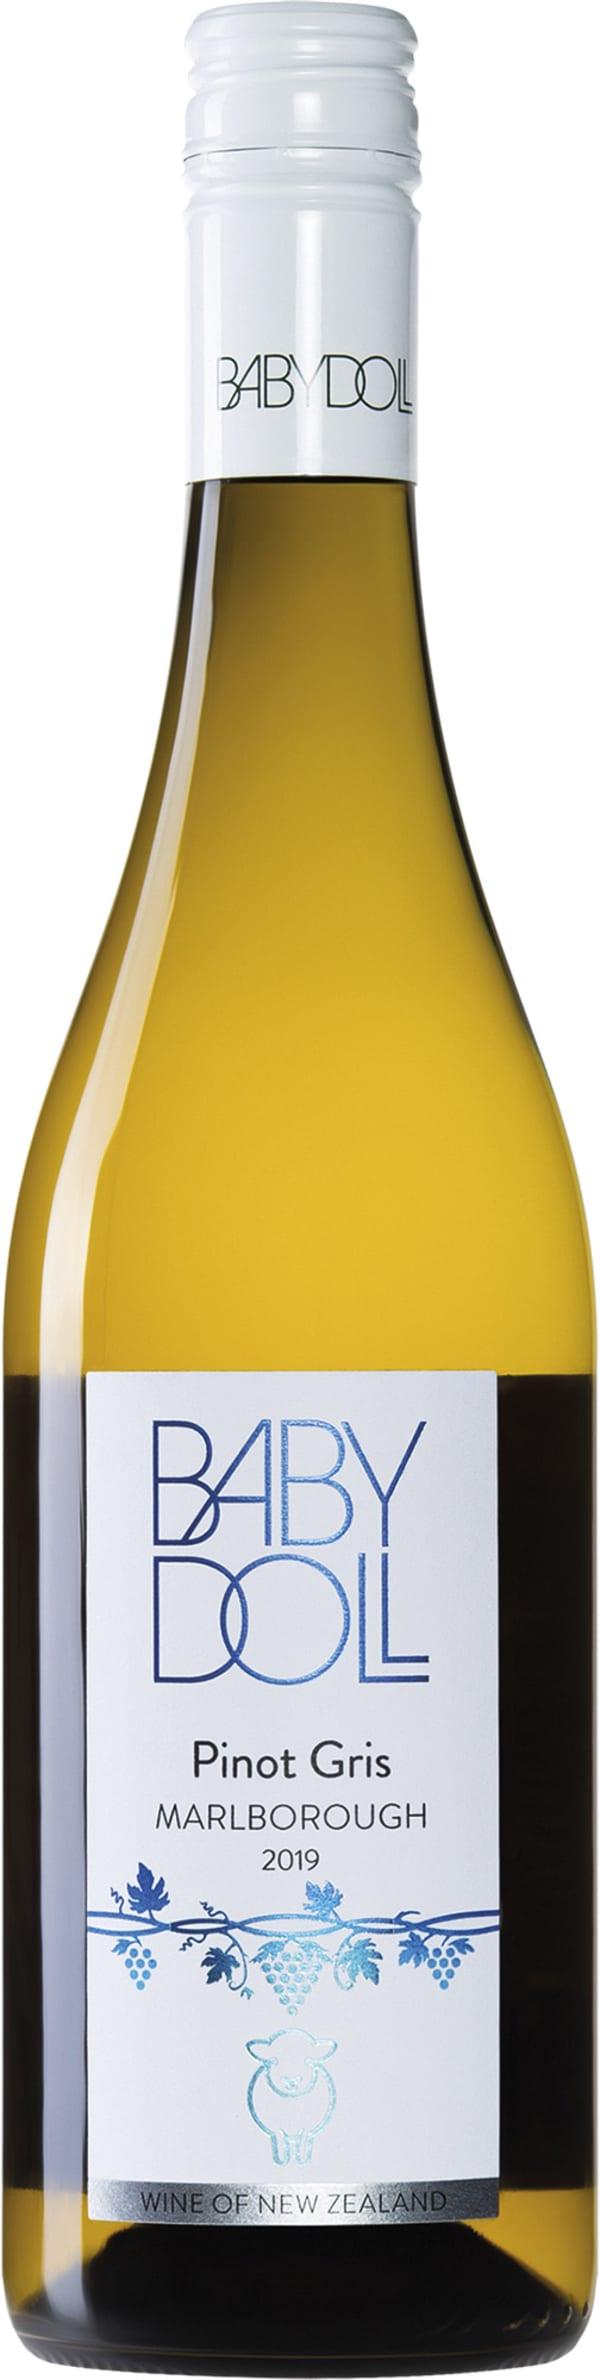 Babydoll Pinot Gris 2019